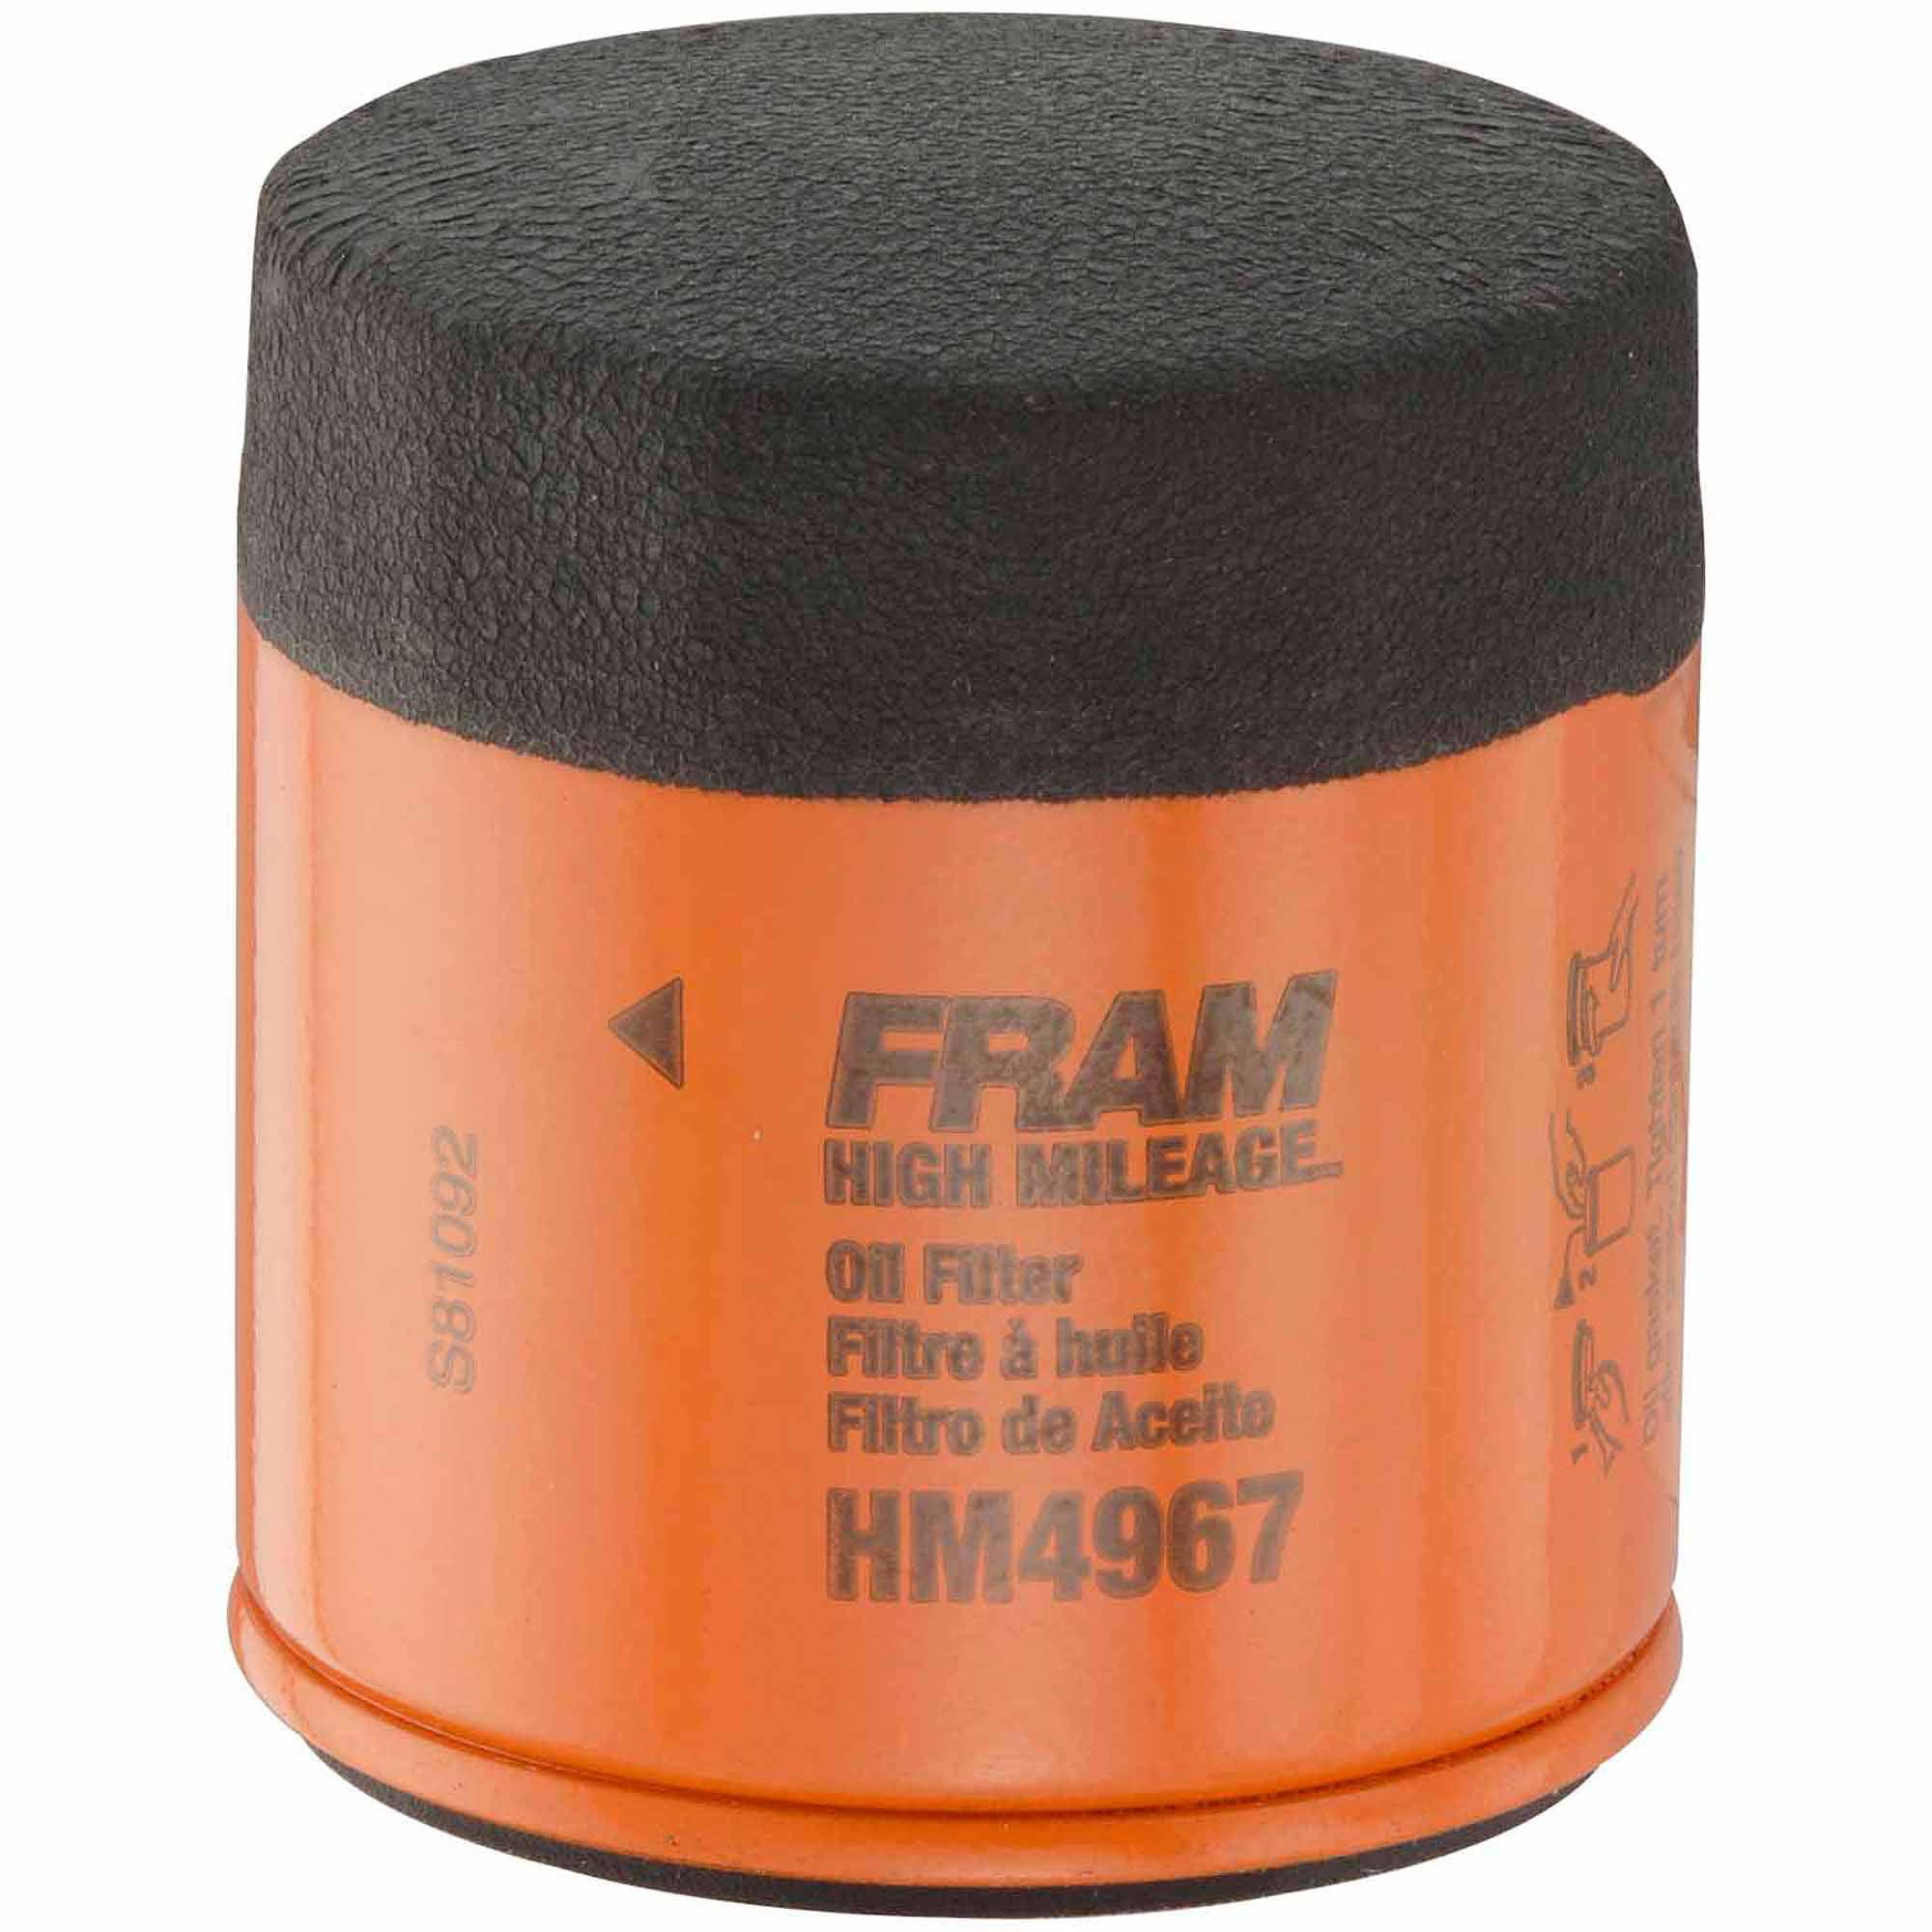 FRAM High Mileage Oil Filter, HM4967